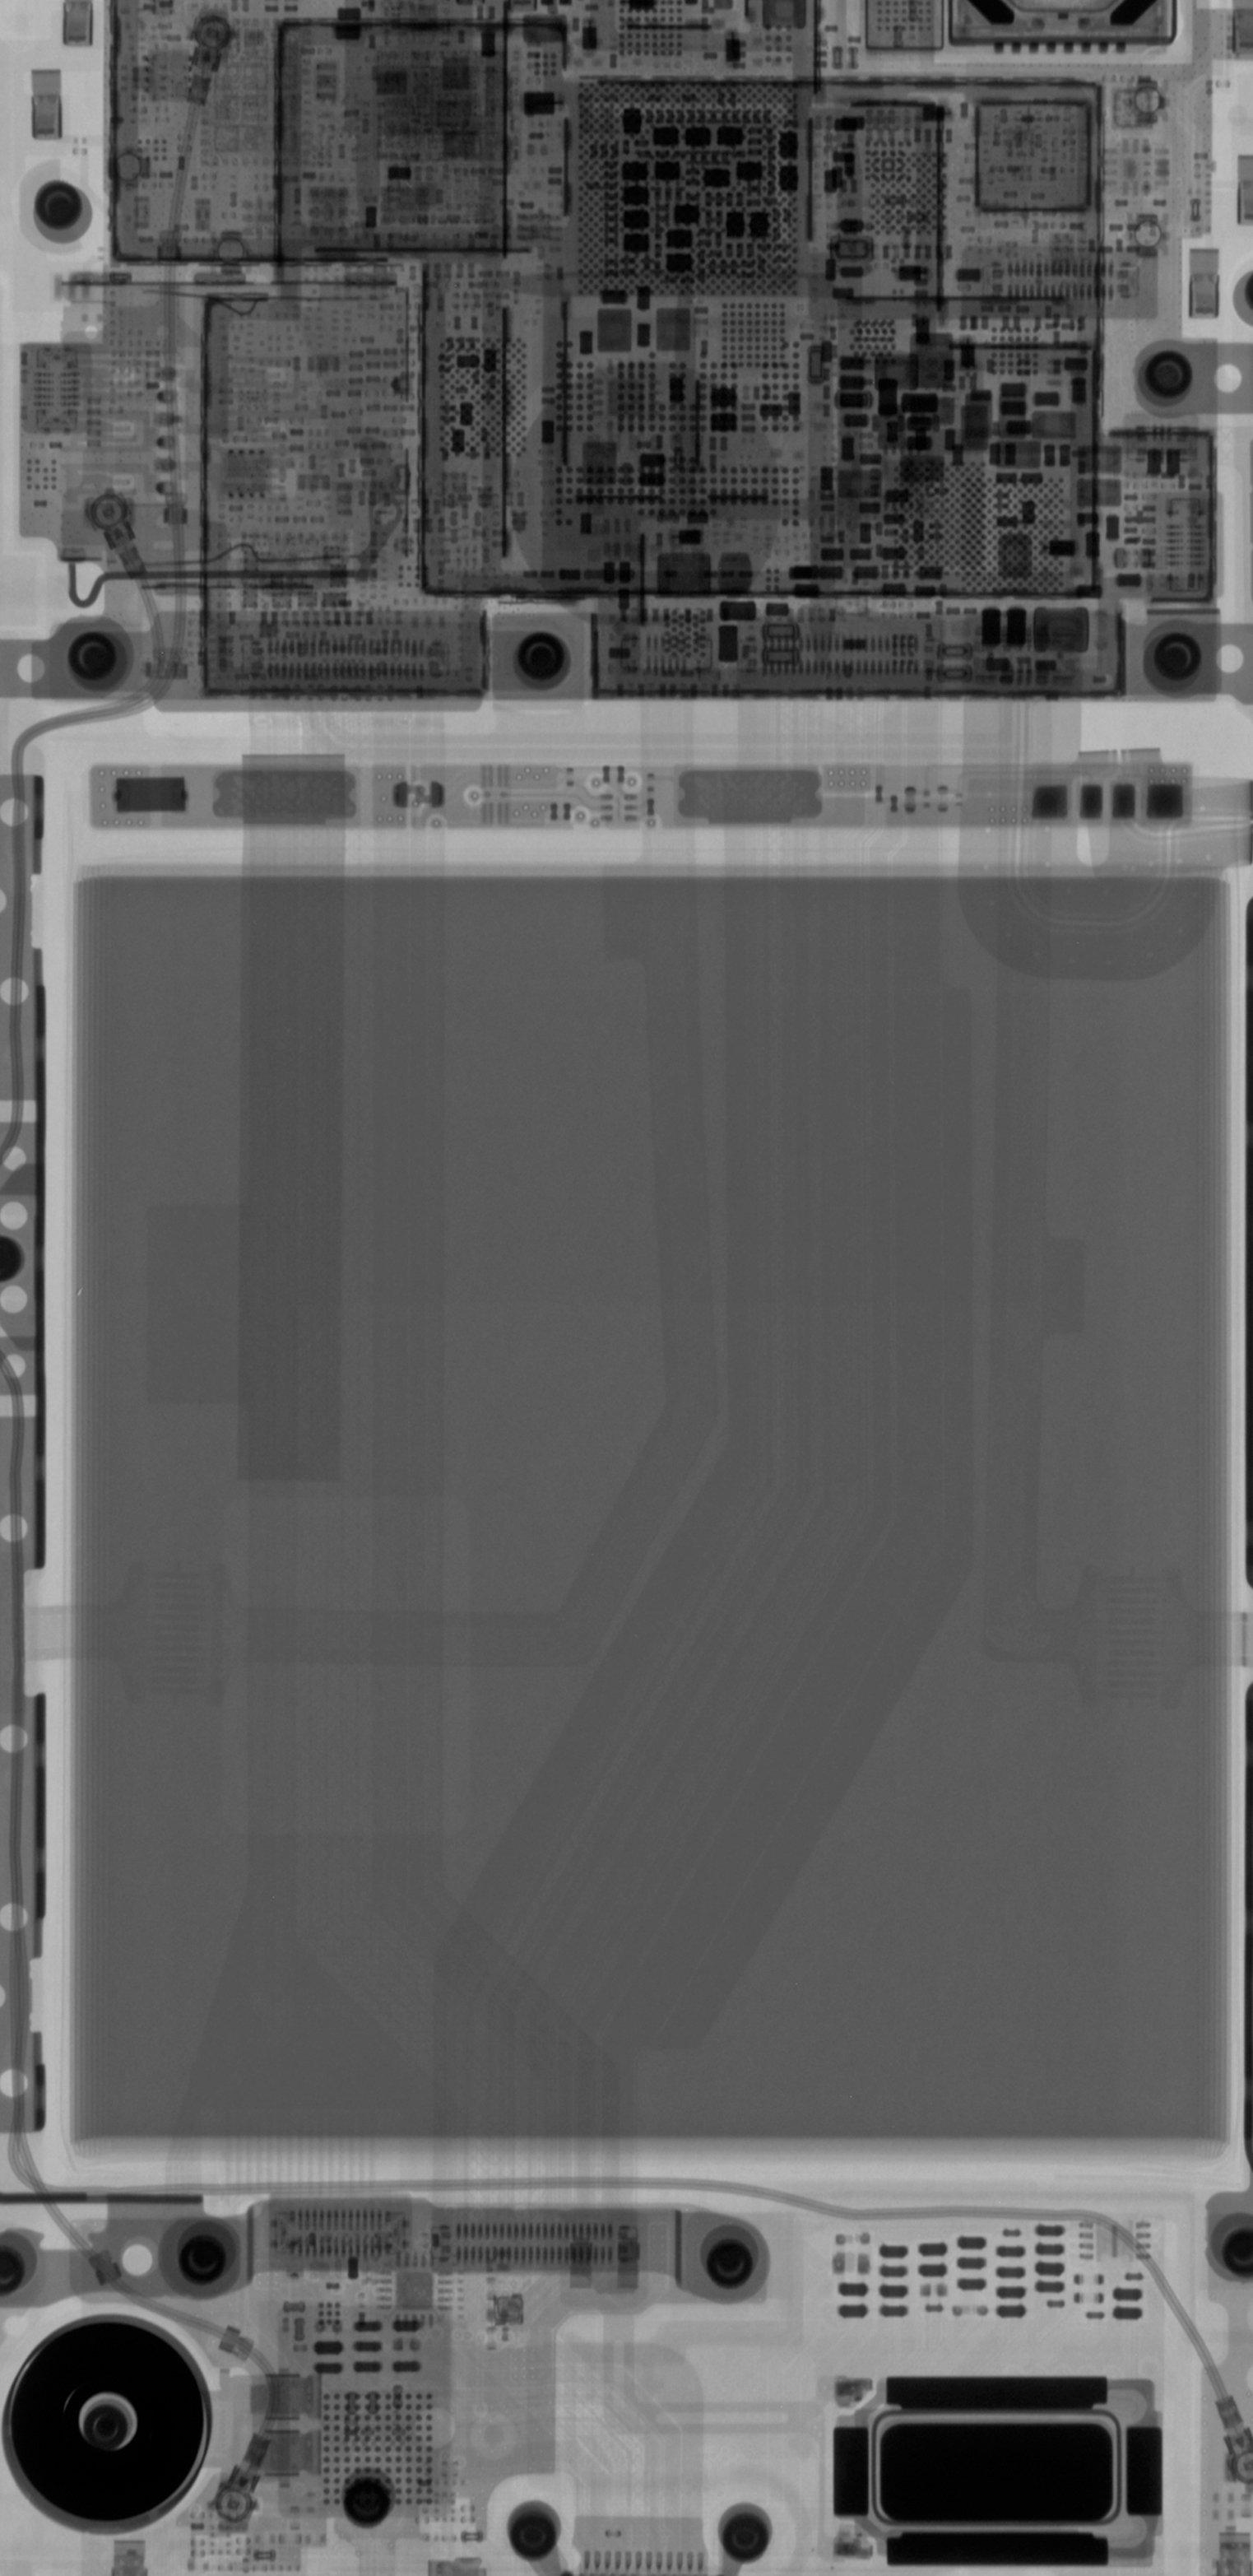 Pixel 3a & Pixel 3a XL Teardown Wallpapers - iFixit